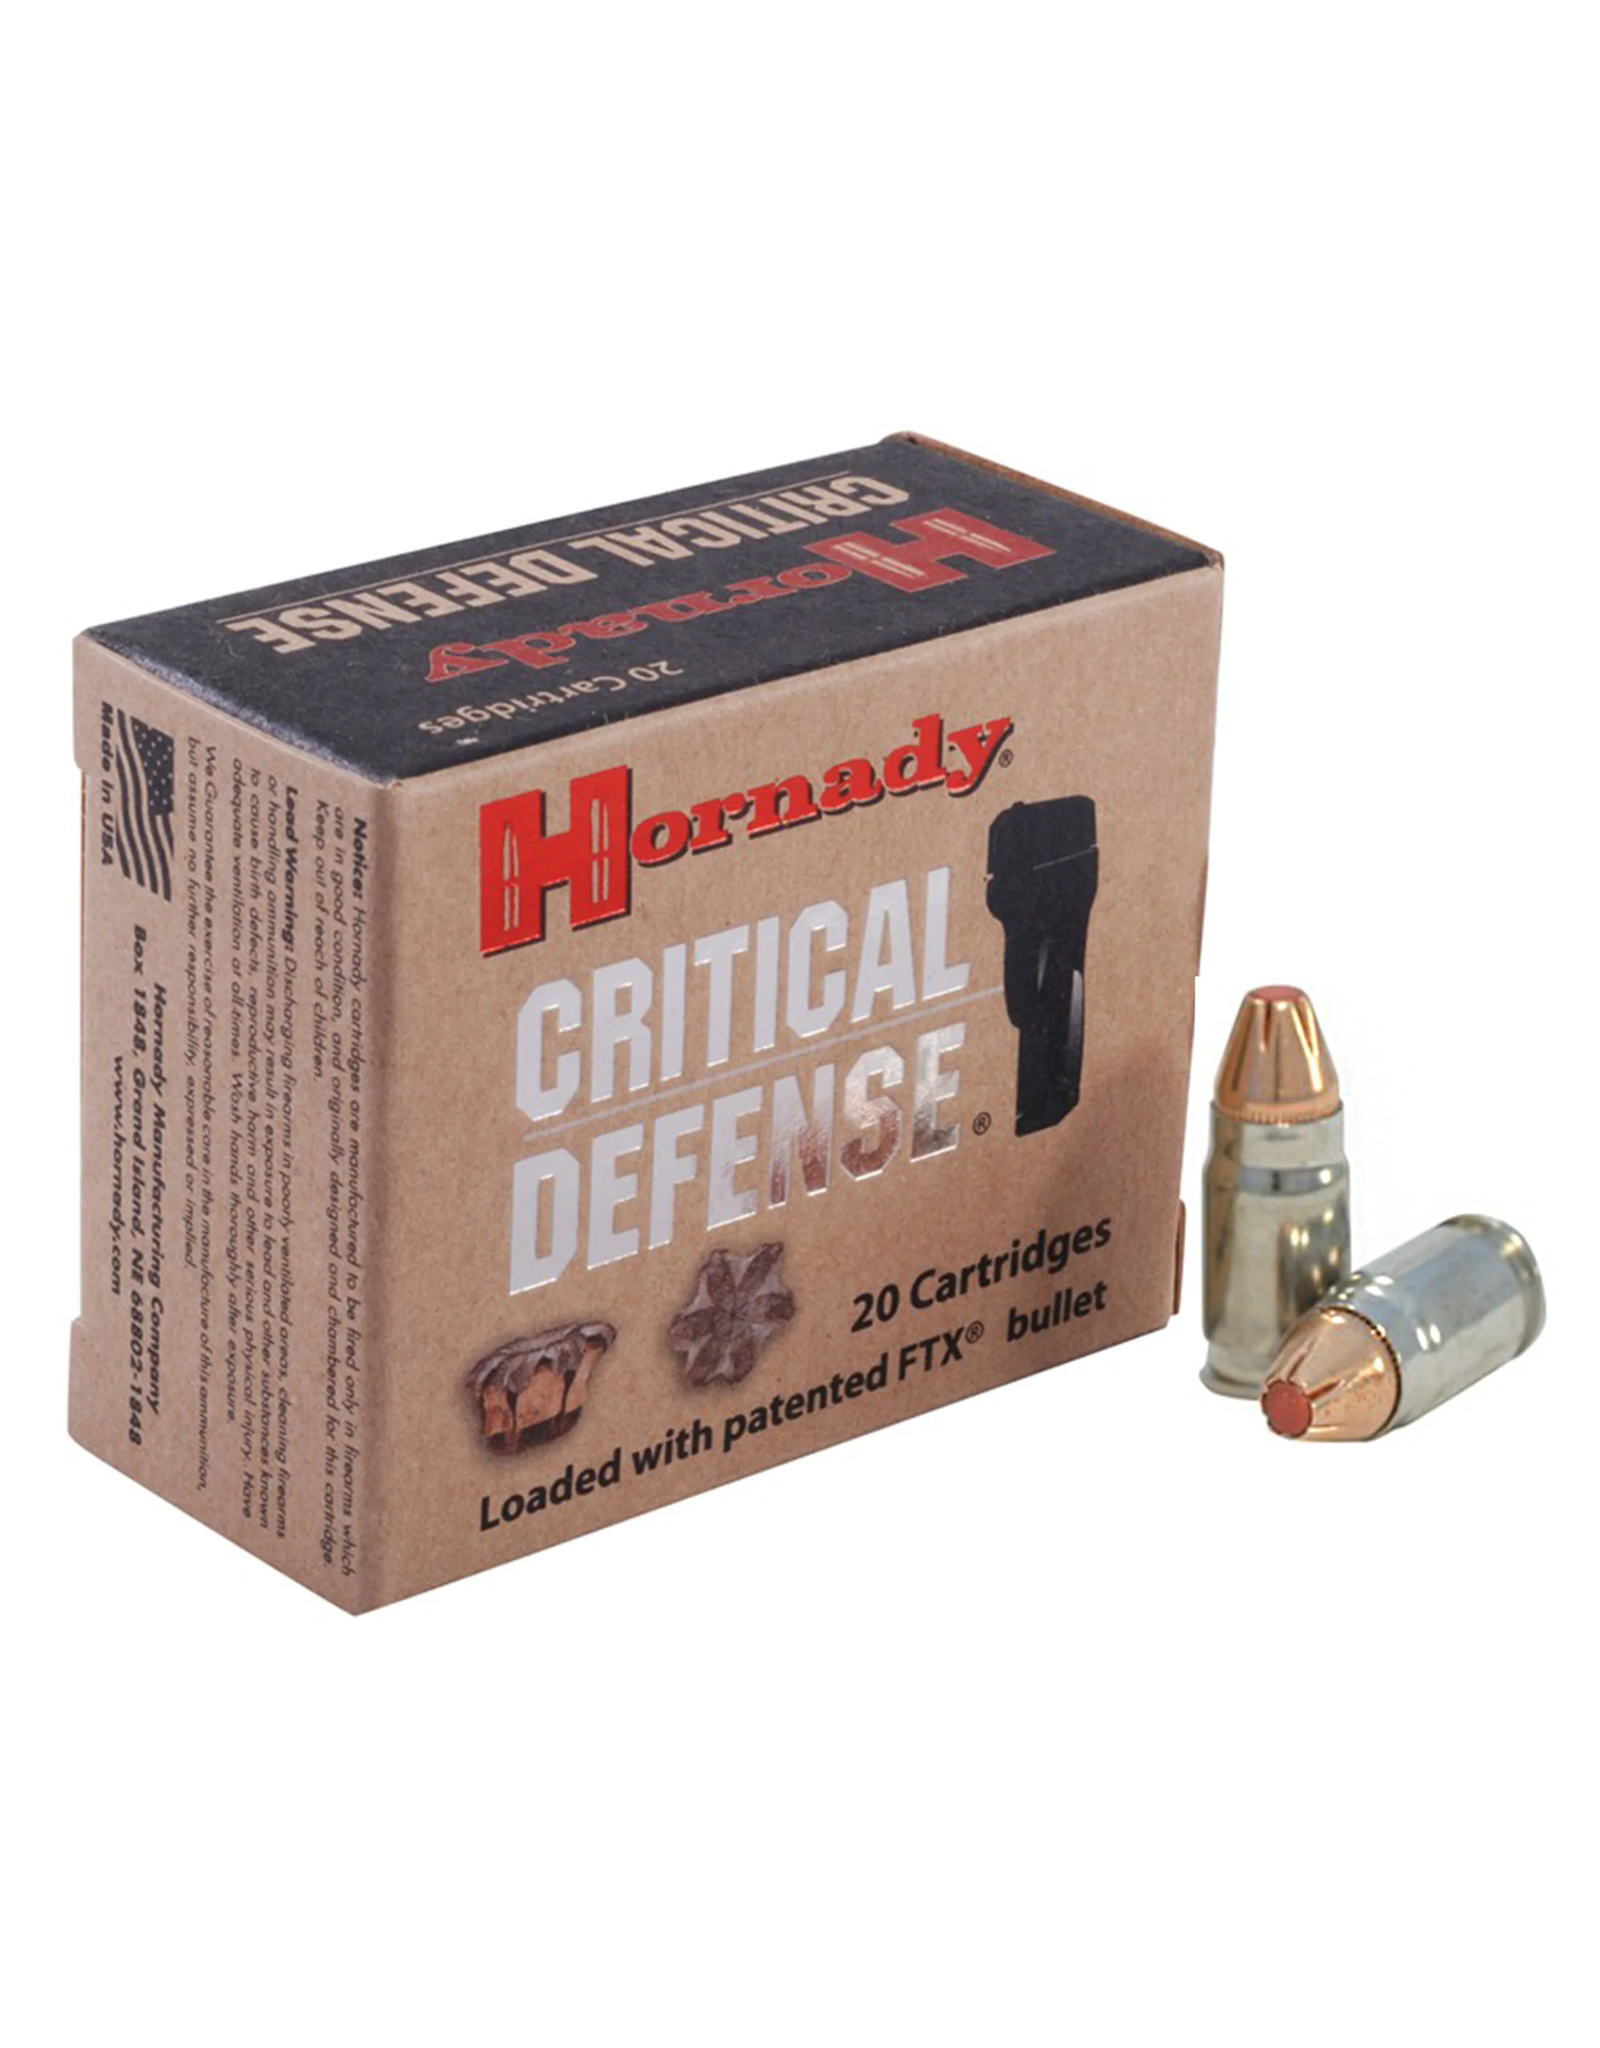 Hornady Hornady - 357 Sig - 115gr Critical Defense FTX - 20ct